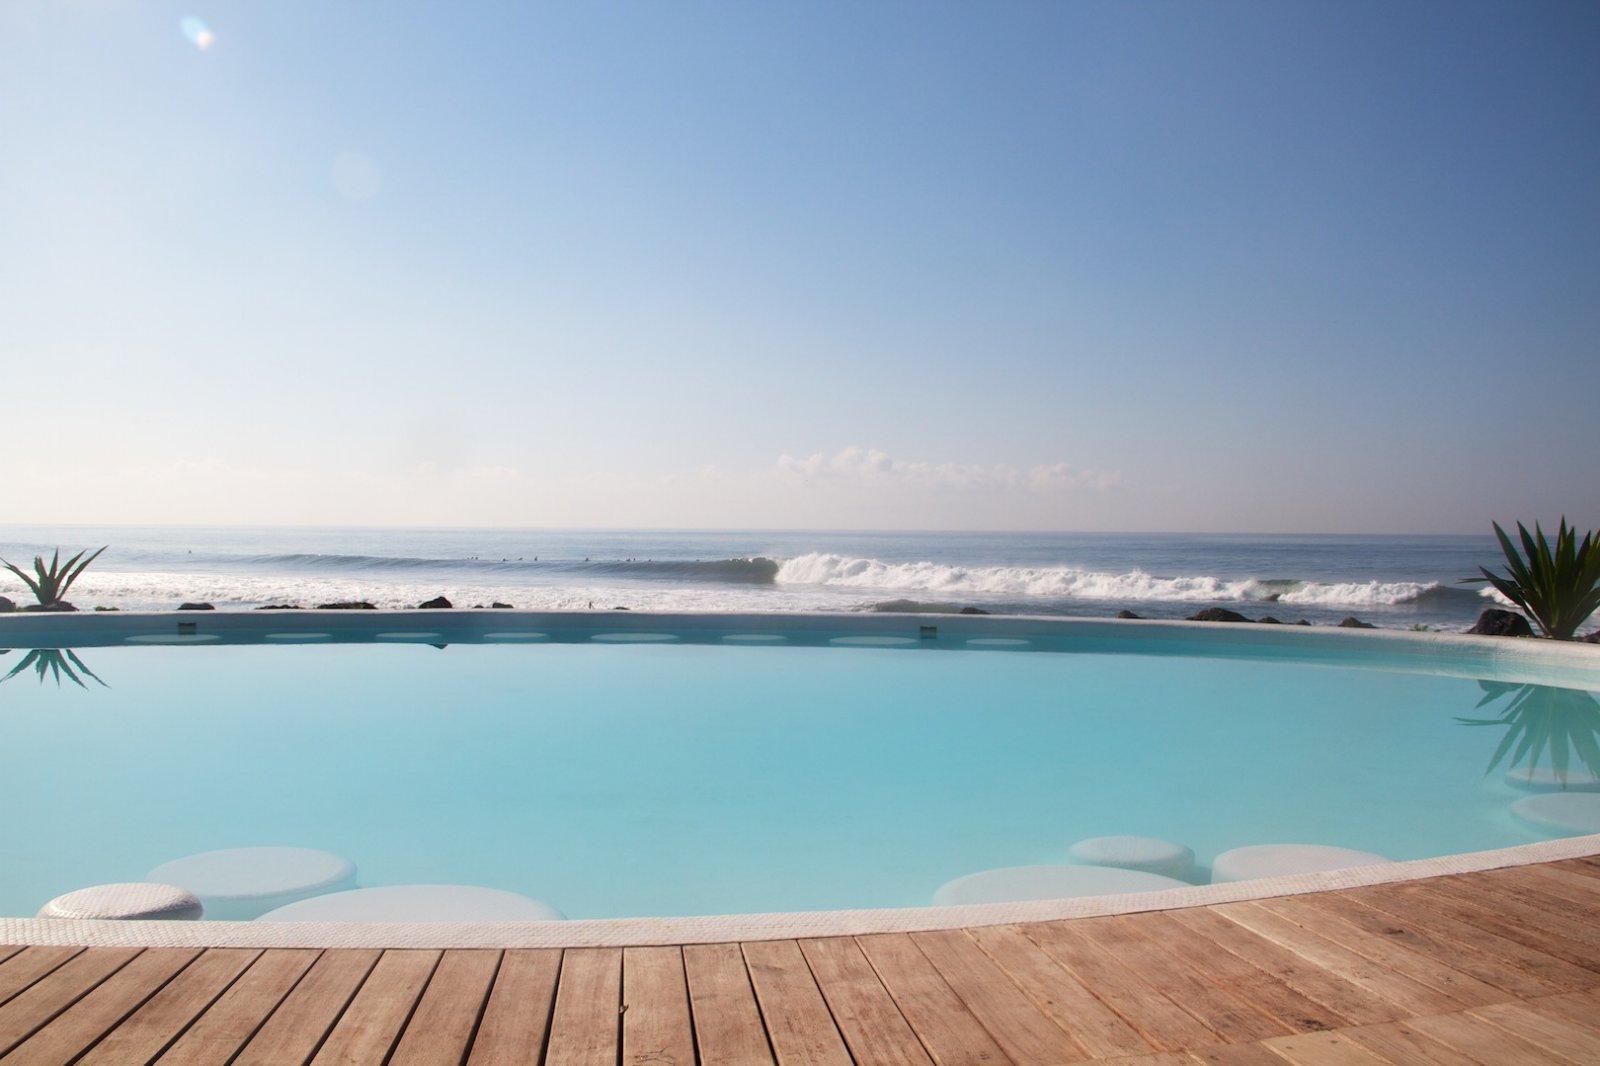 Komune-Bali-Pool-Mor-6DLK.jpg